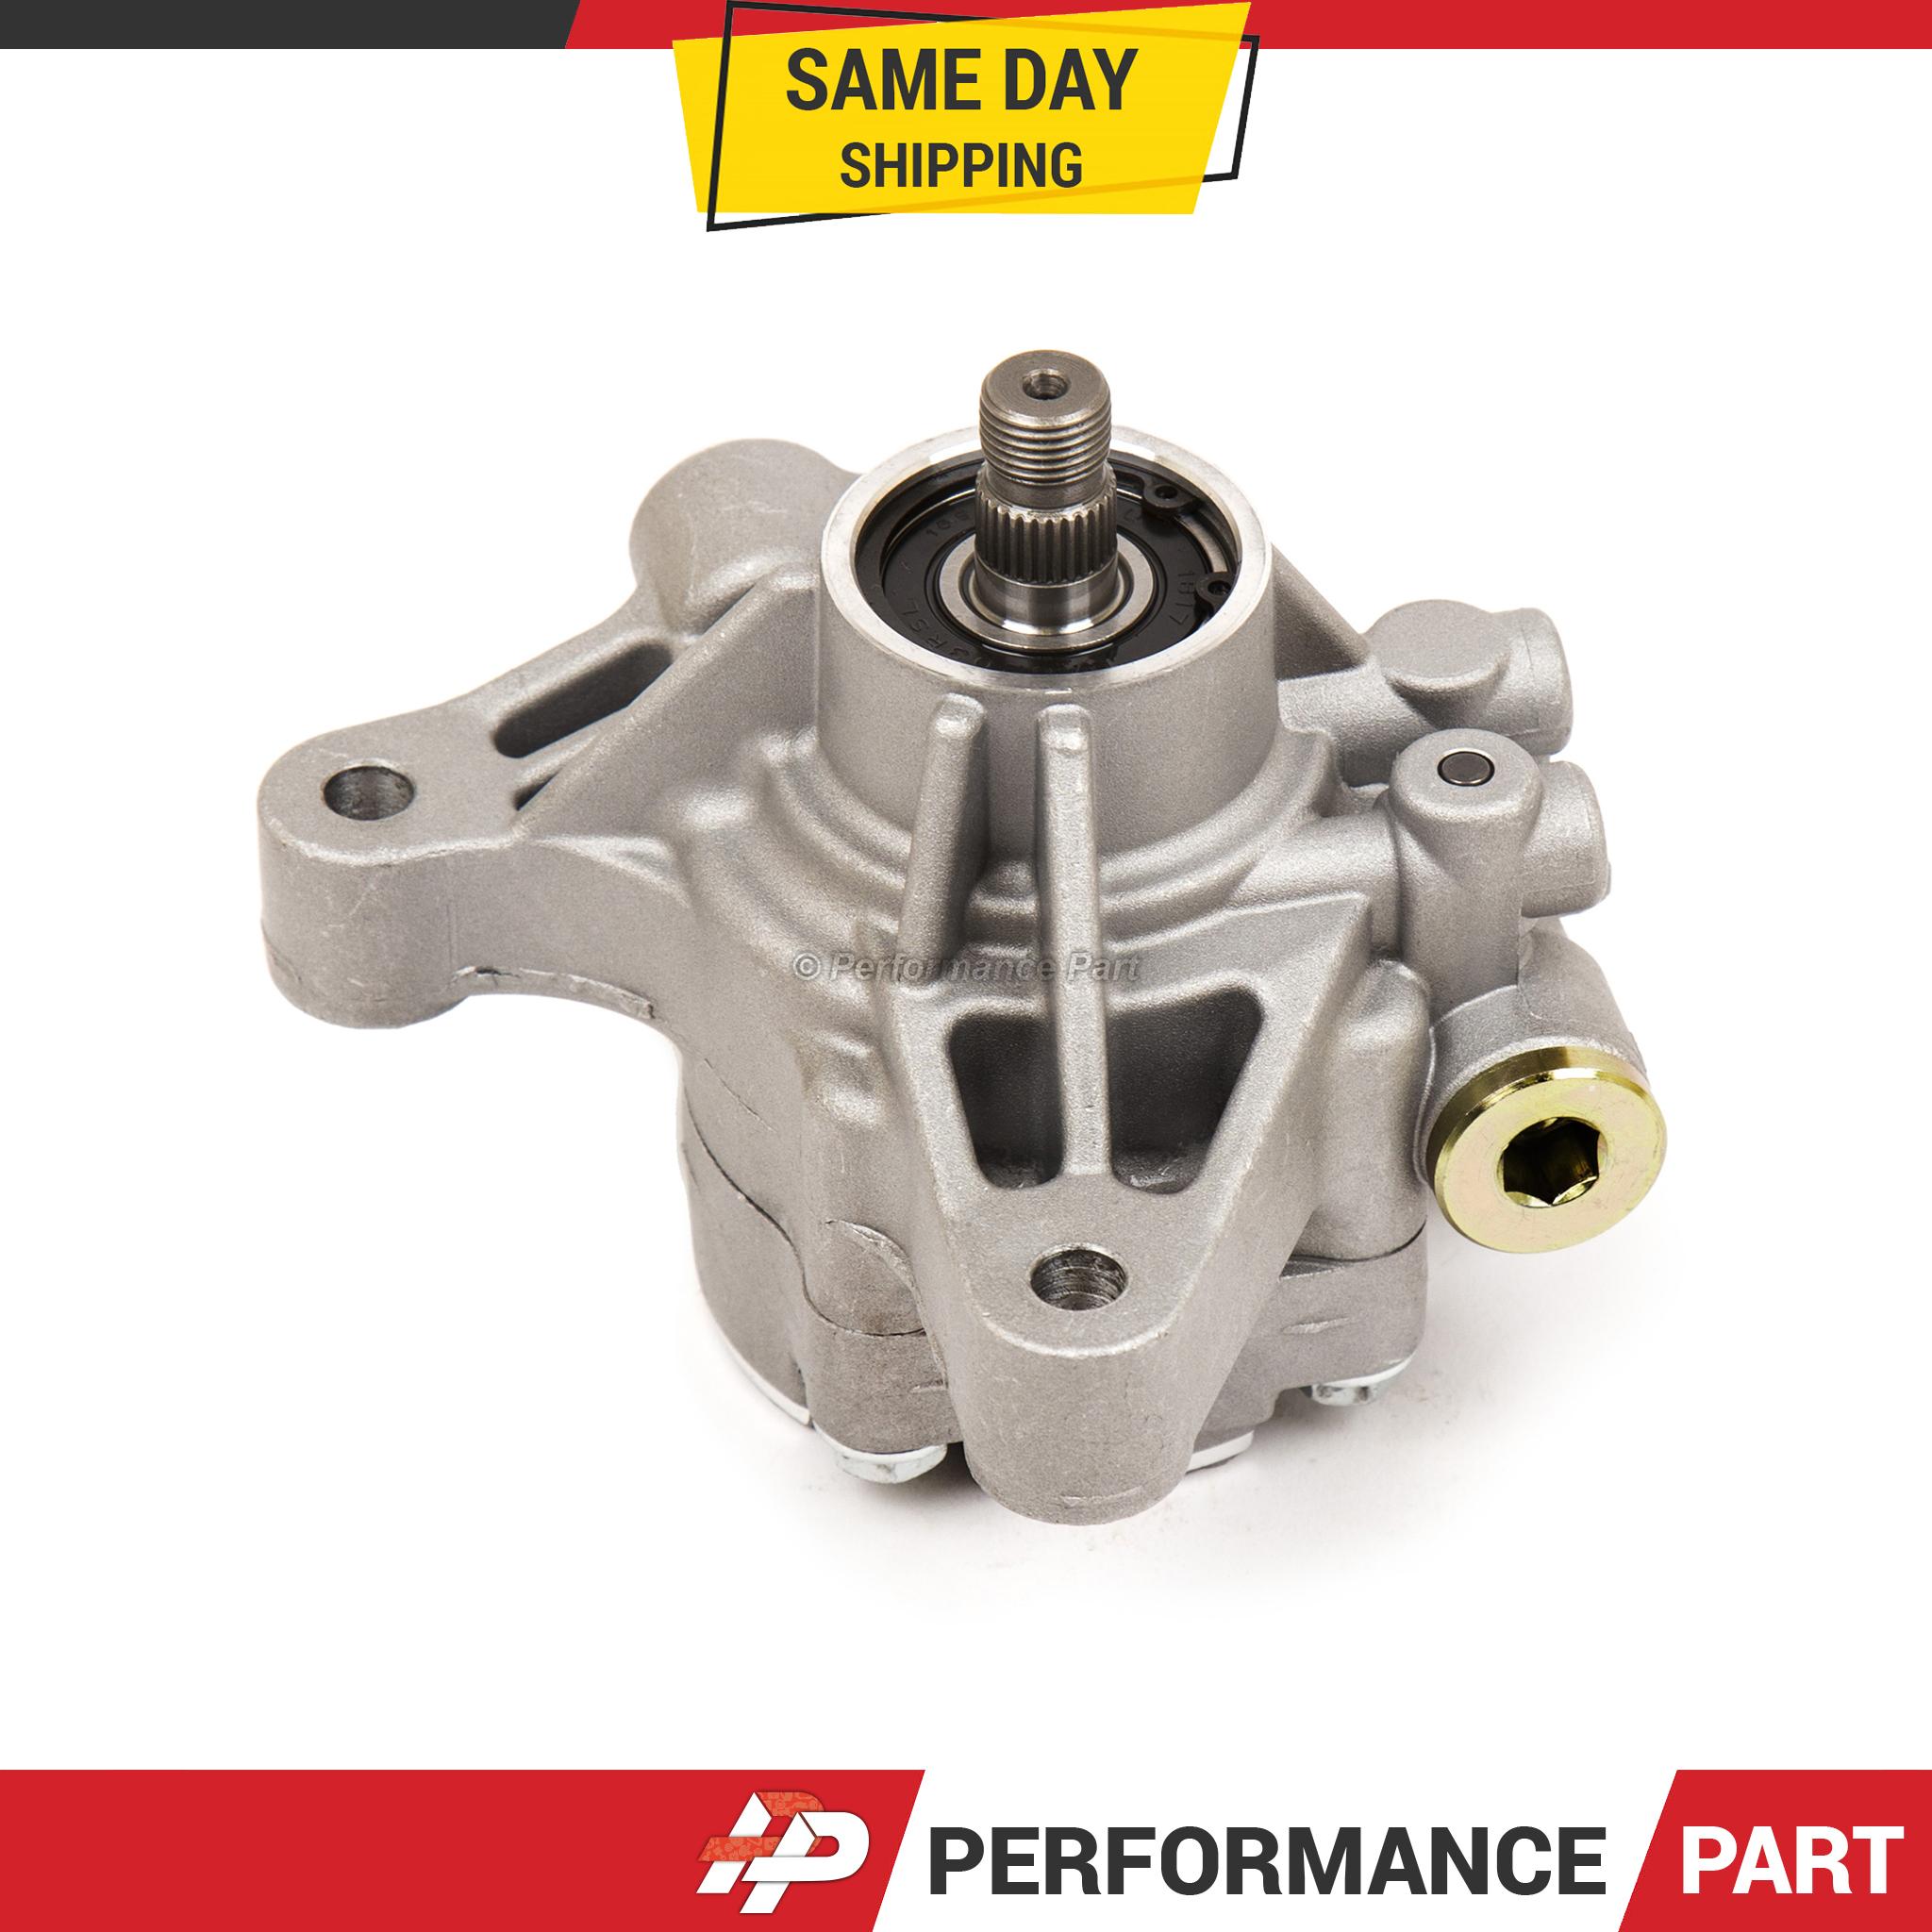 Power Steering Pump For 02-11 Honda CR-V Accord Acura RSX